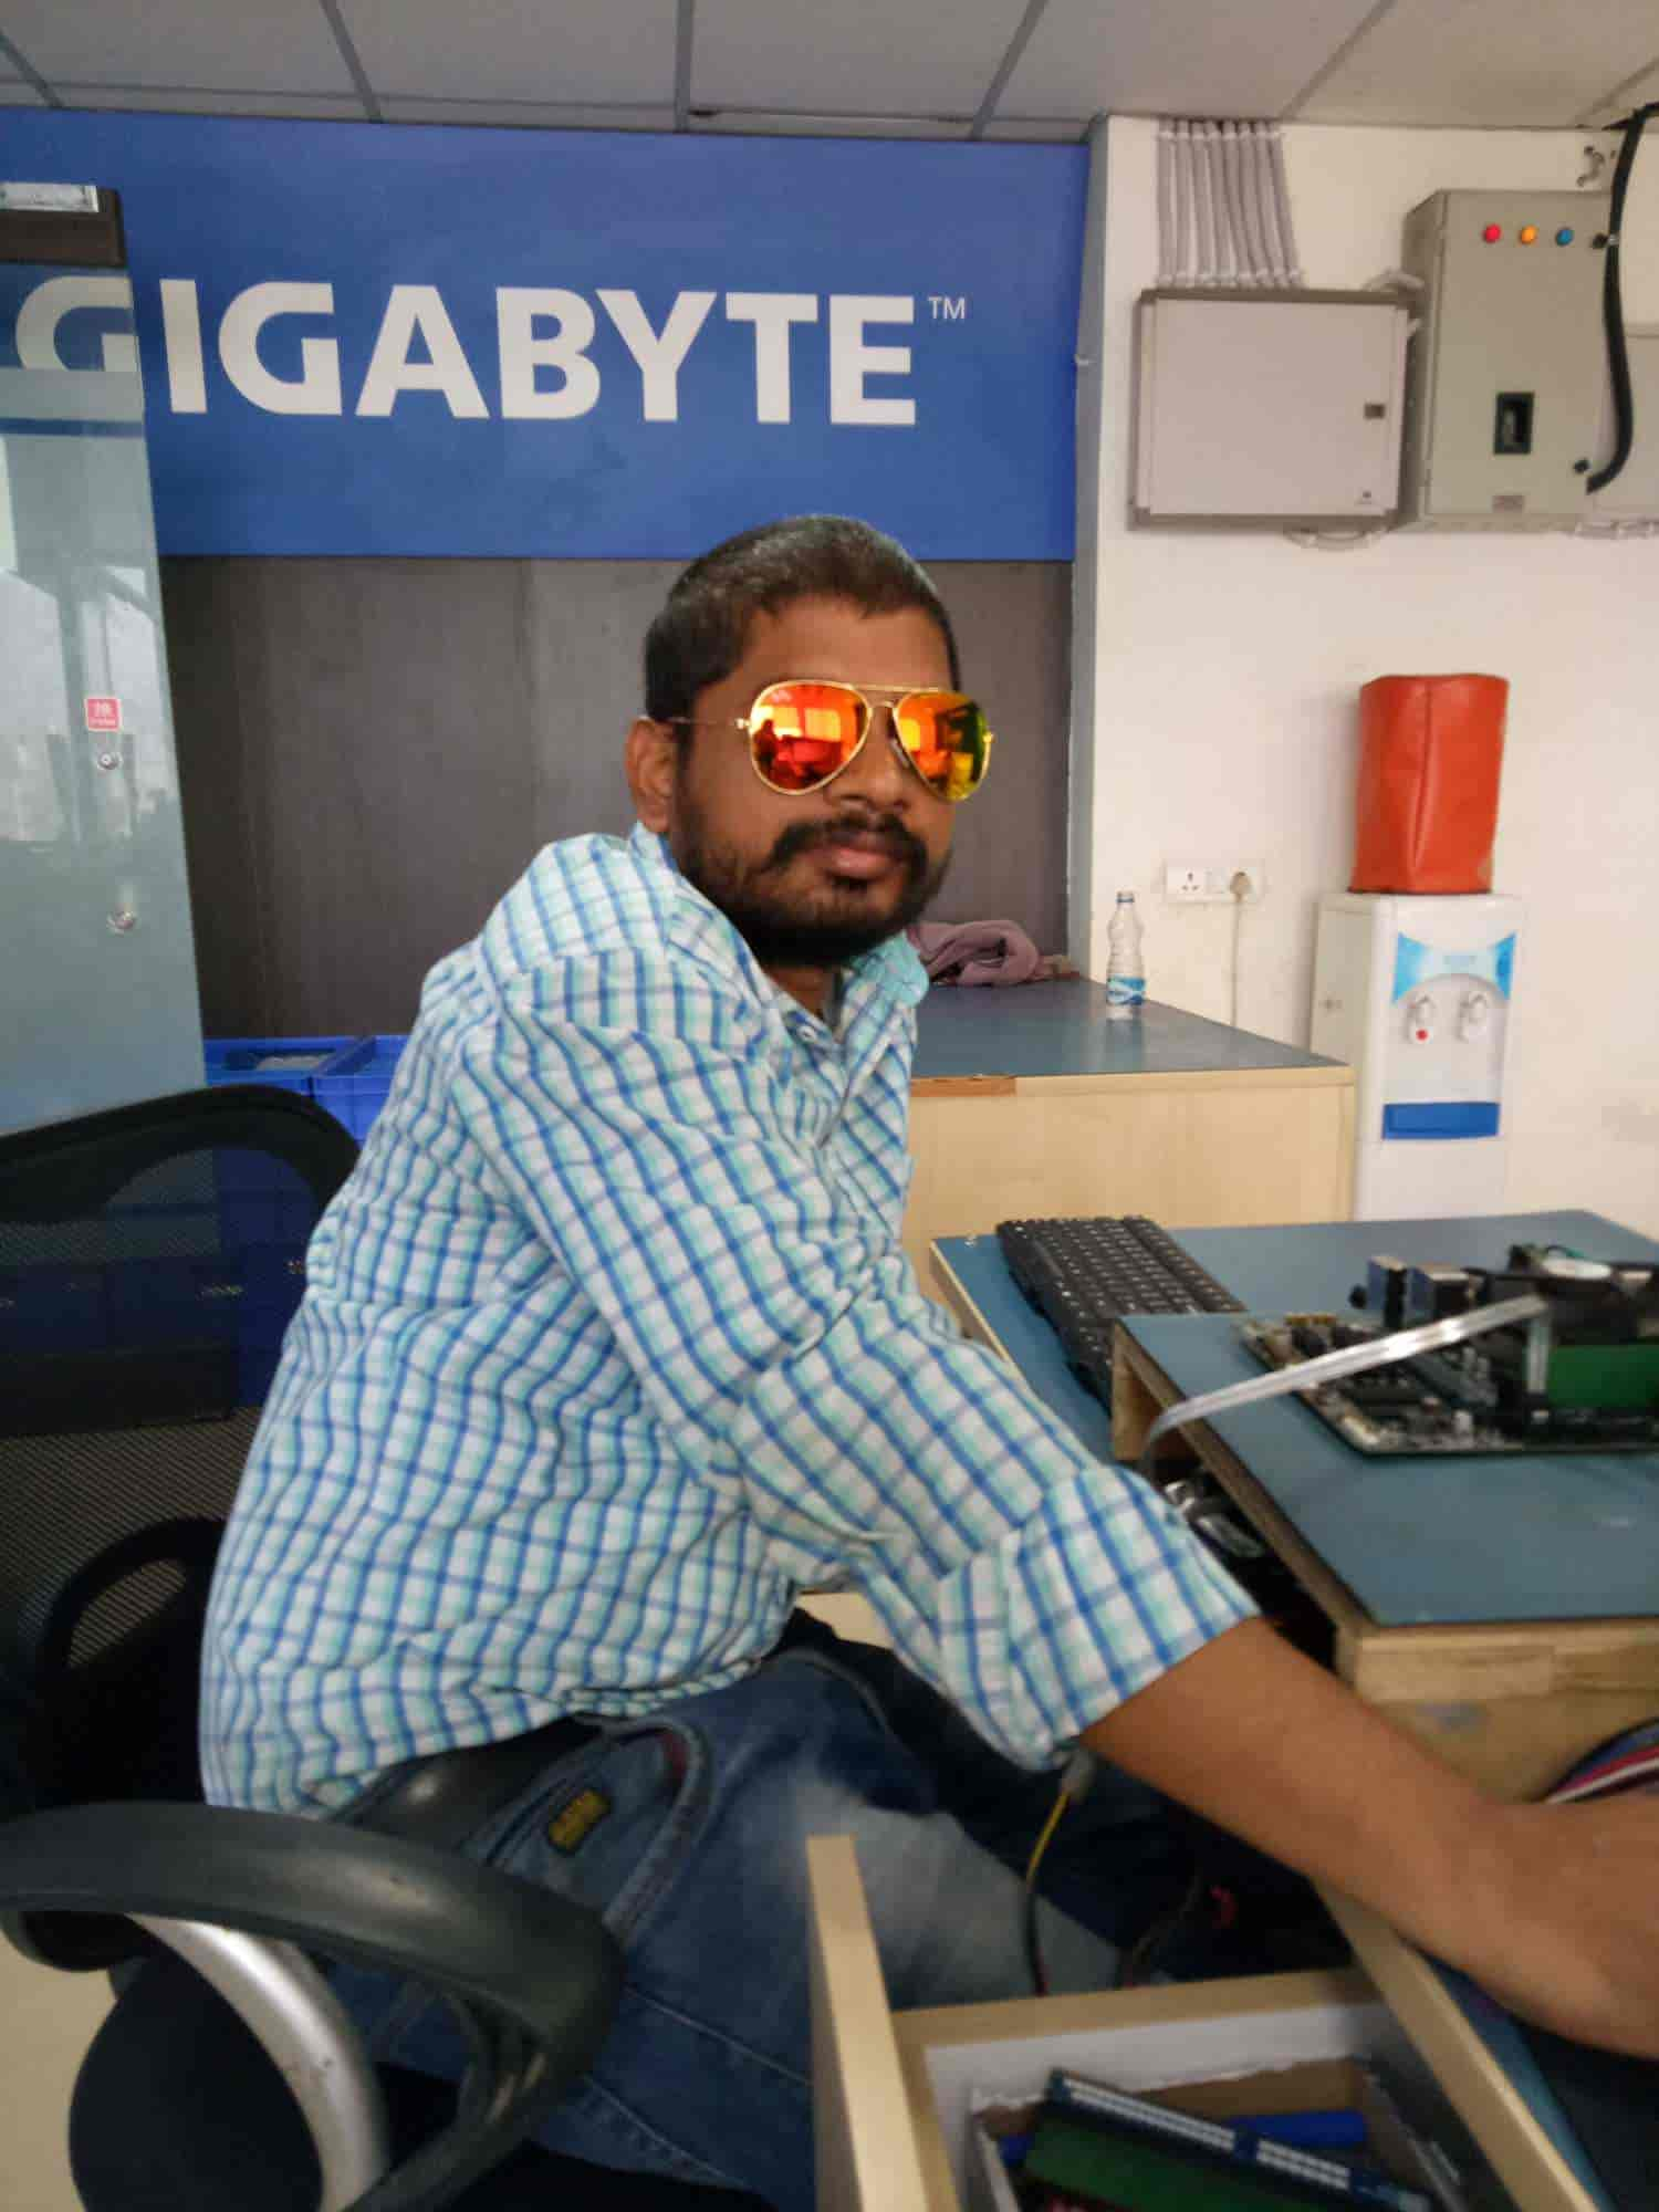 Gigabyte Service Centre, Nehru Place - Computer Motherboard